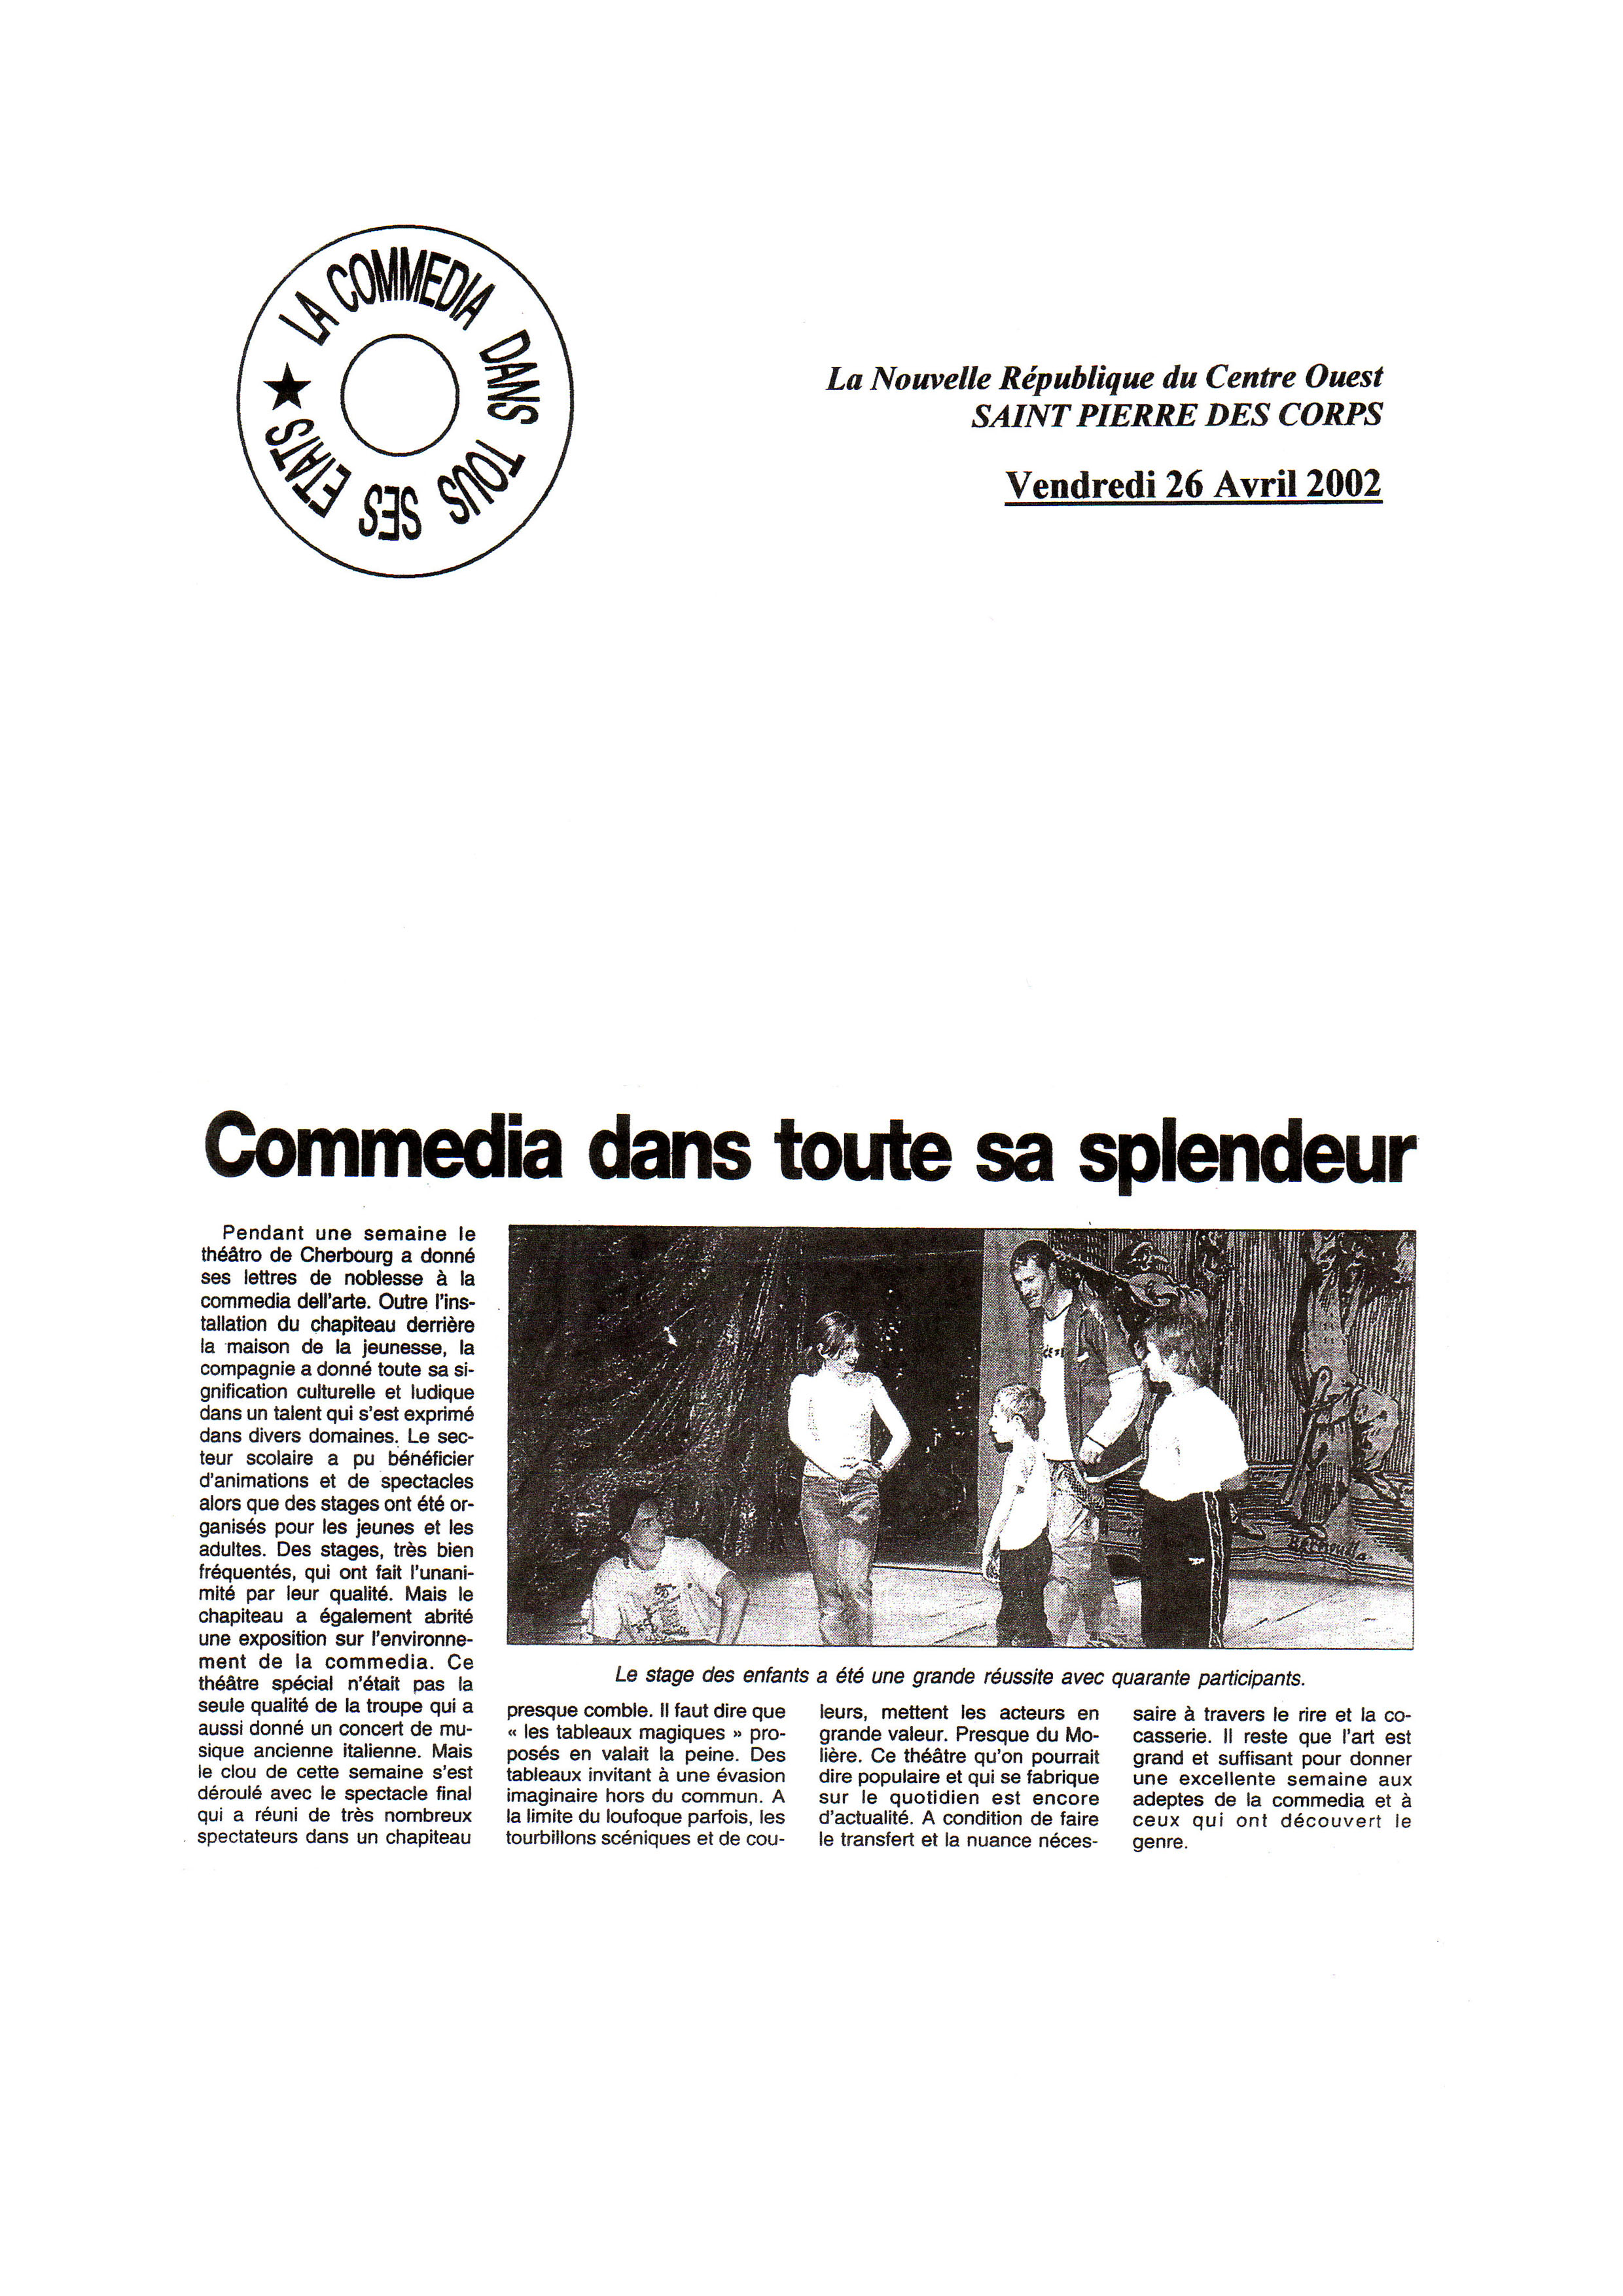 St Pierre des Corps 26.04.02.jpg